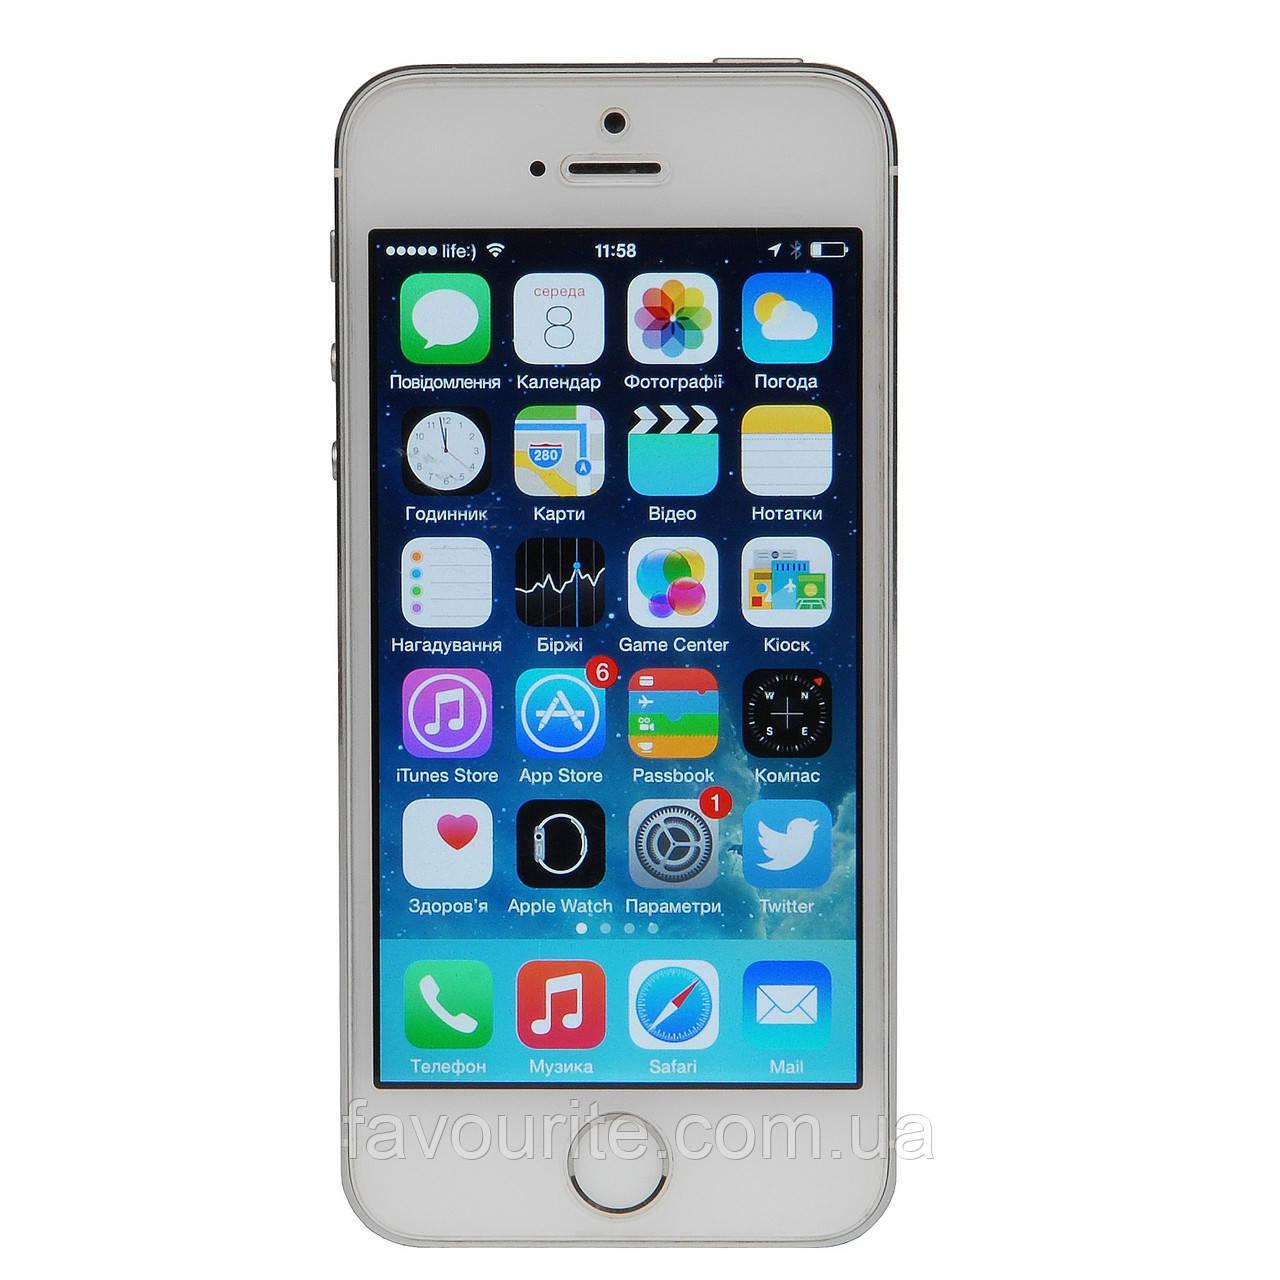 Apple iPhone 5S 32GB Silver Refurbished (hub_crIl30726)